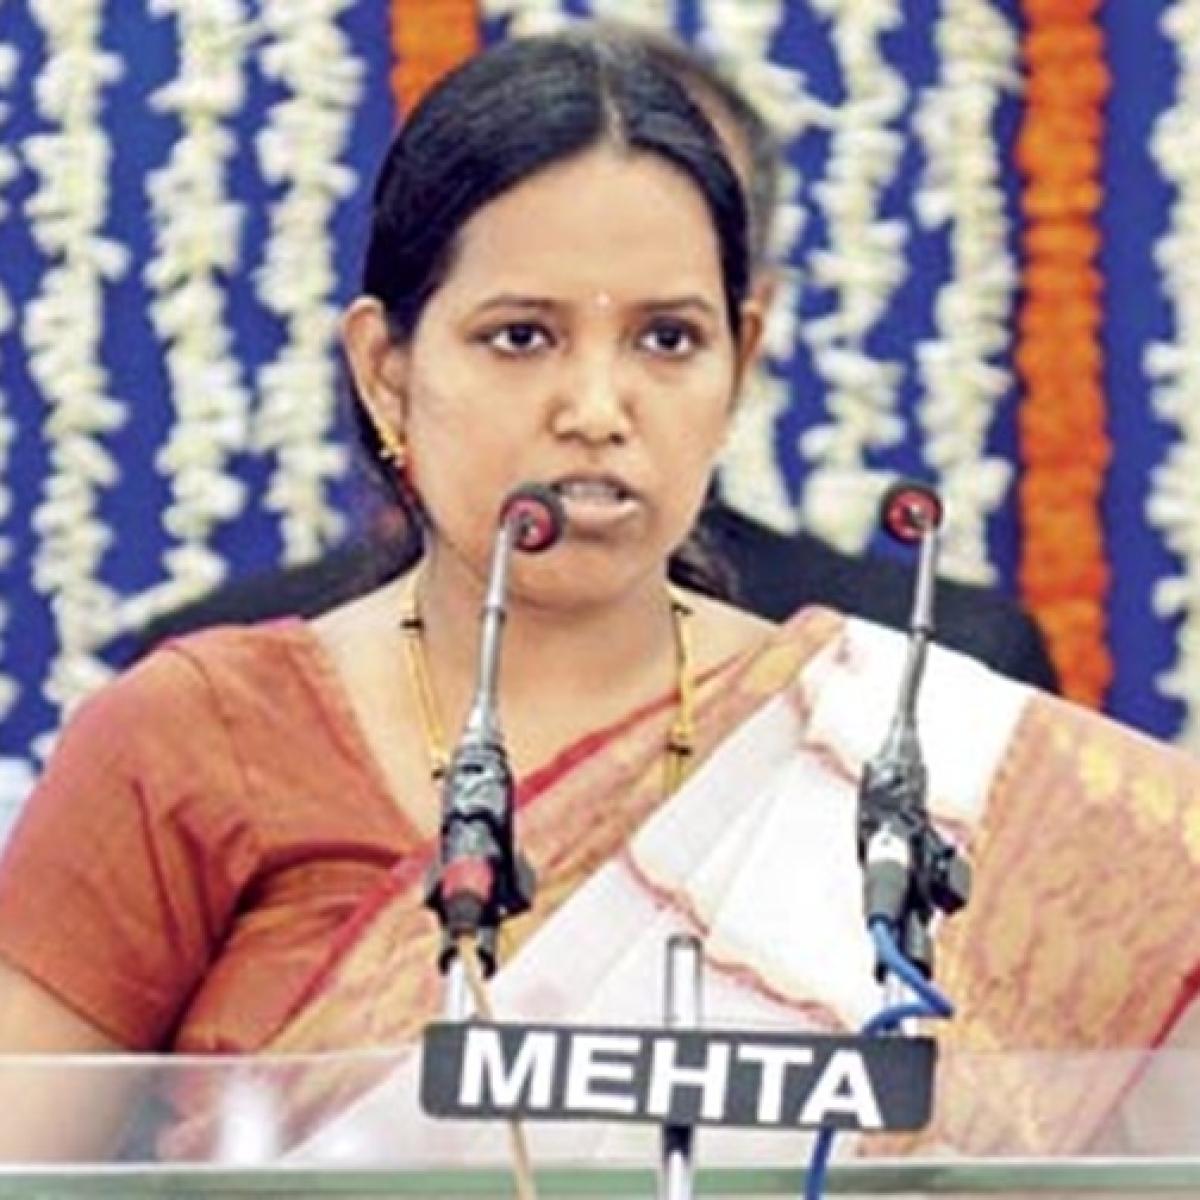 Maharashtra Election 2019 - Dharavi Assembly Constituency of Mumbai: Congress Varsha Eknath Gaikwad wins